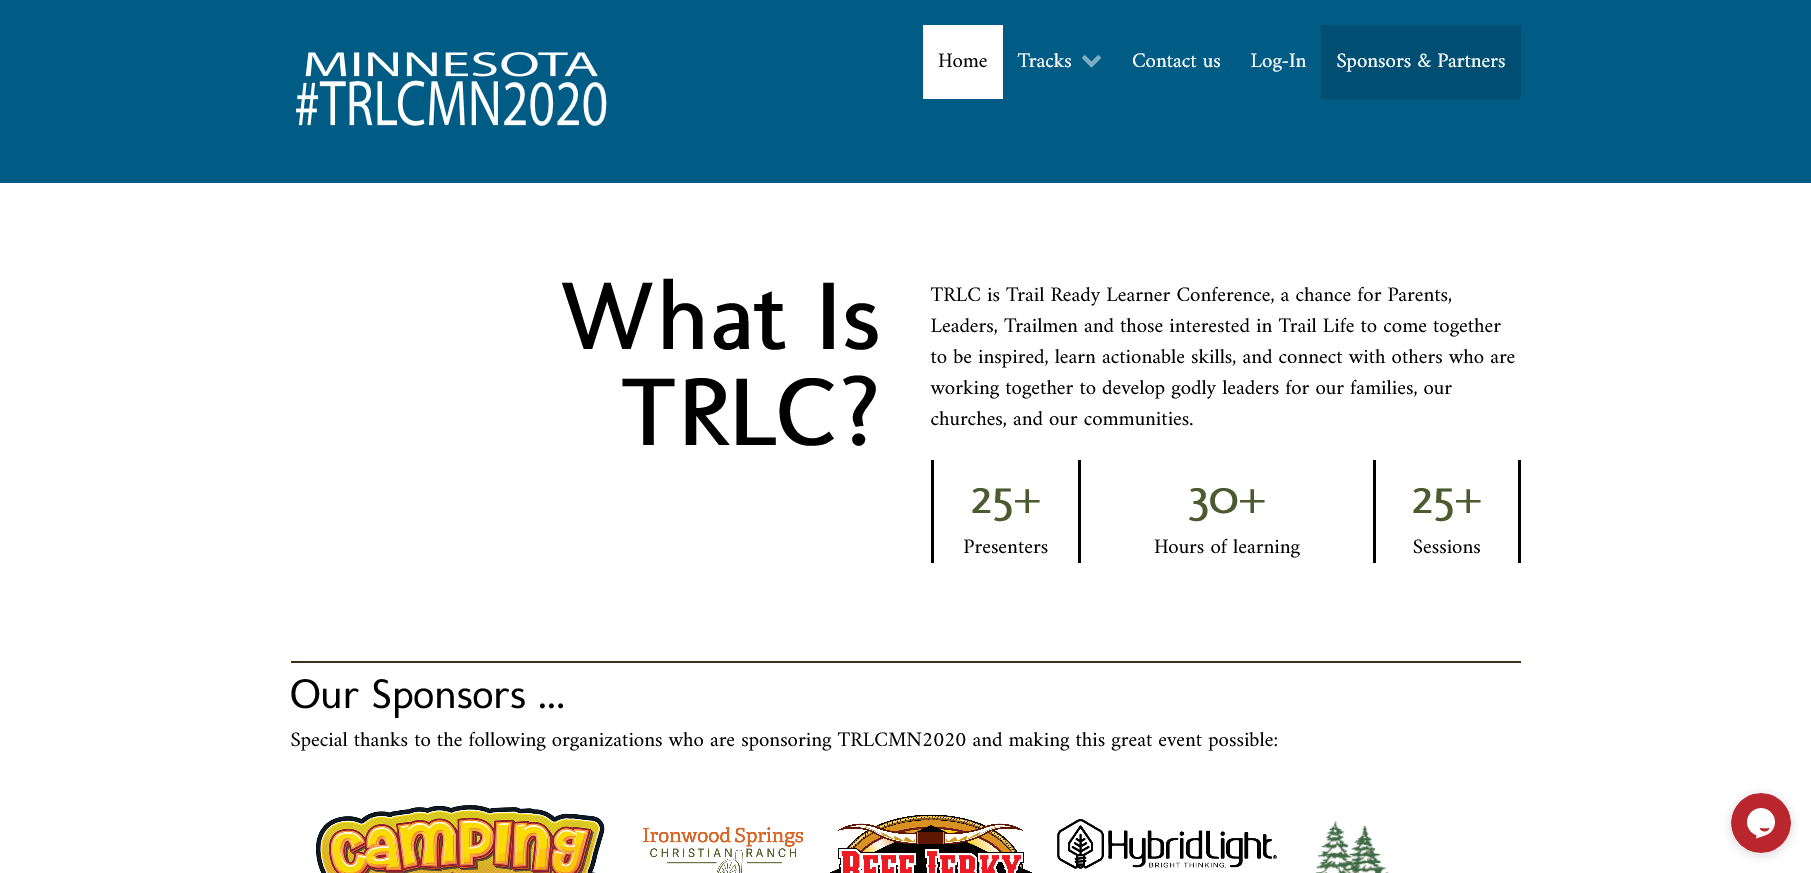 TRLC Minnesota 2020